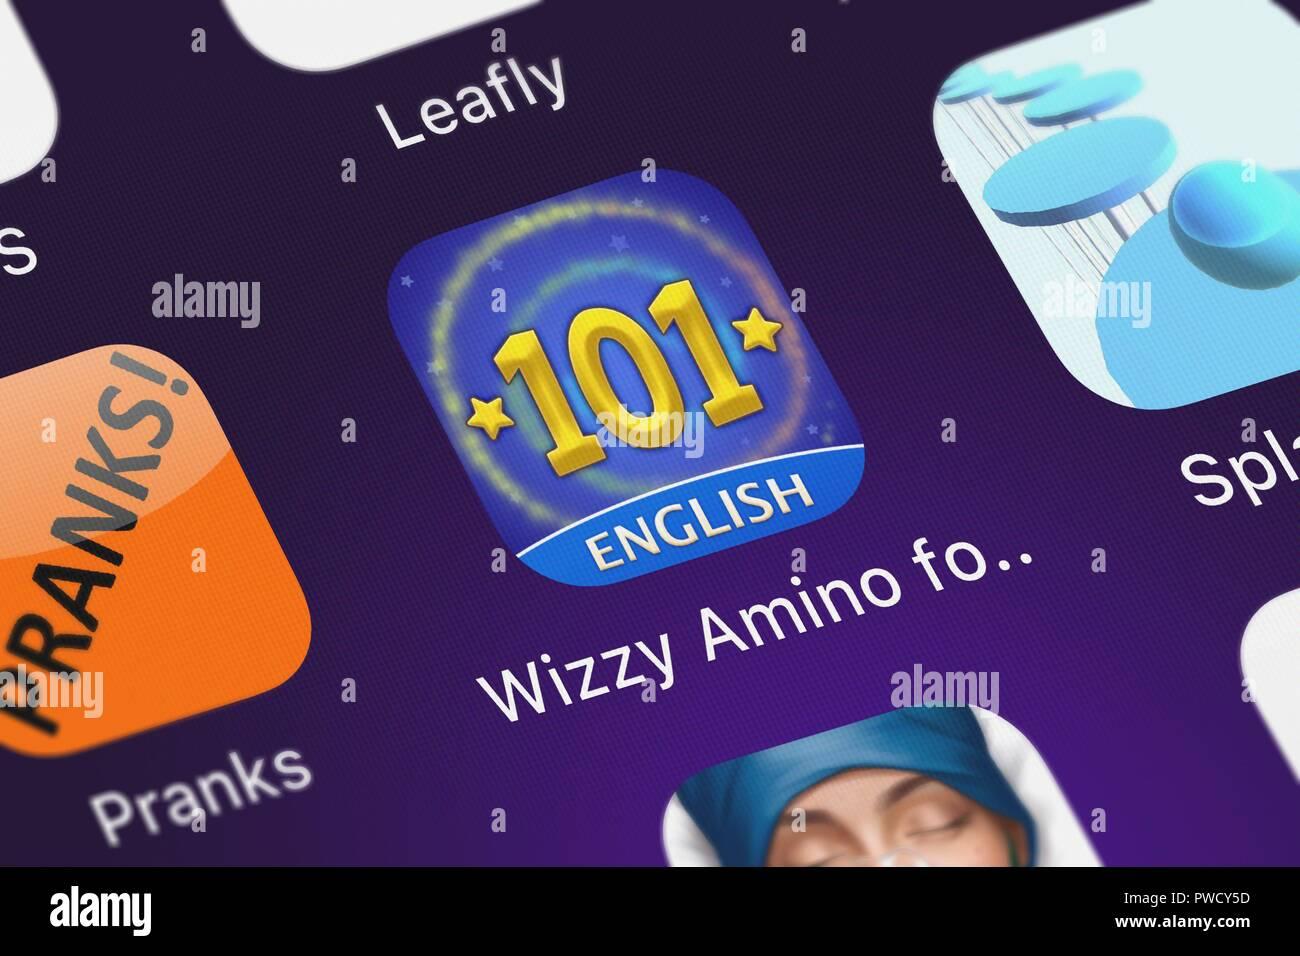 Wizzy Amino For Wizard101 Stock Photos & Wizzy Amino For